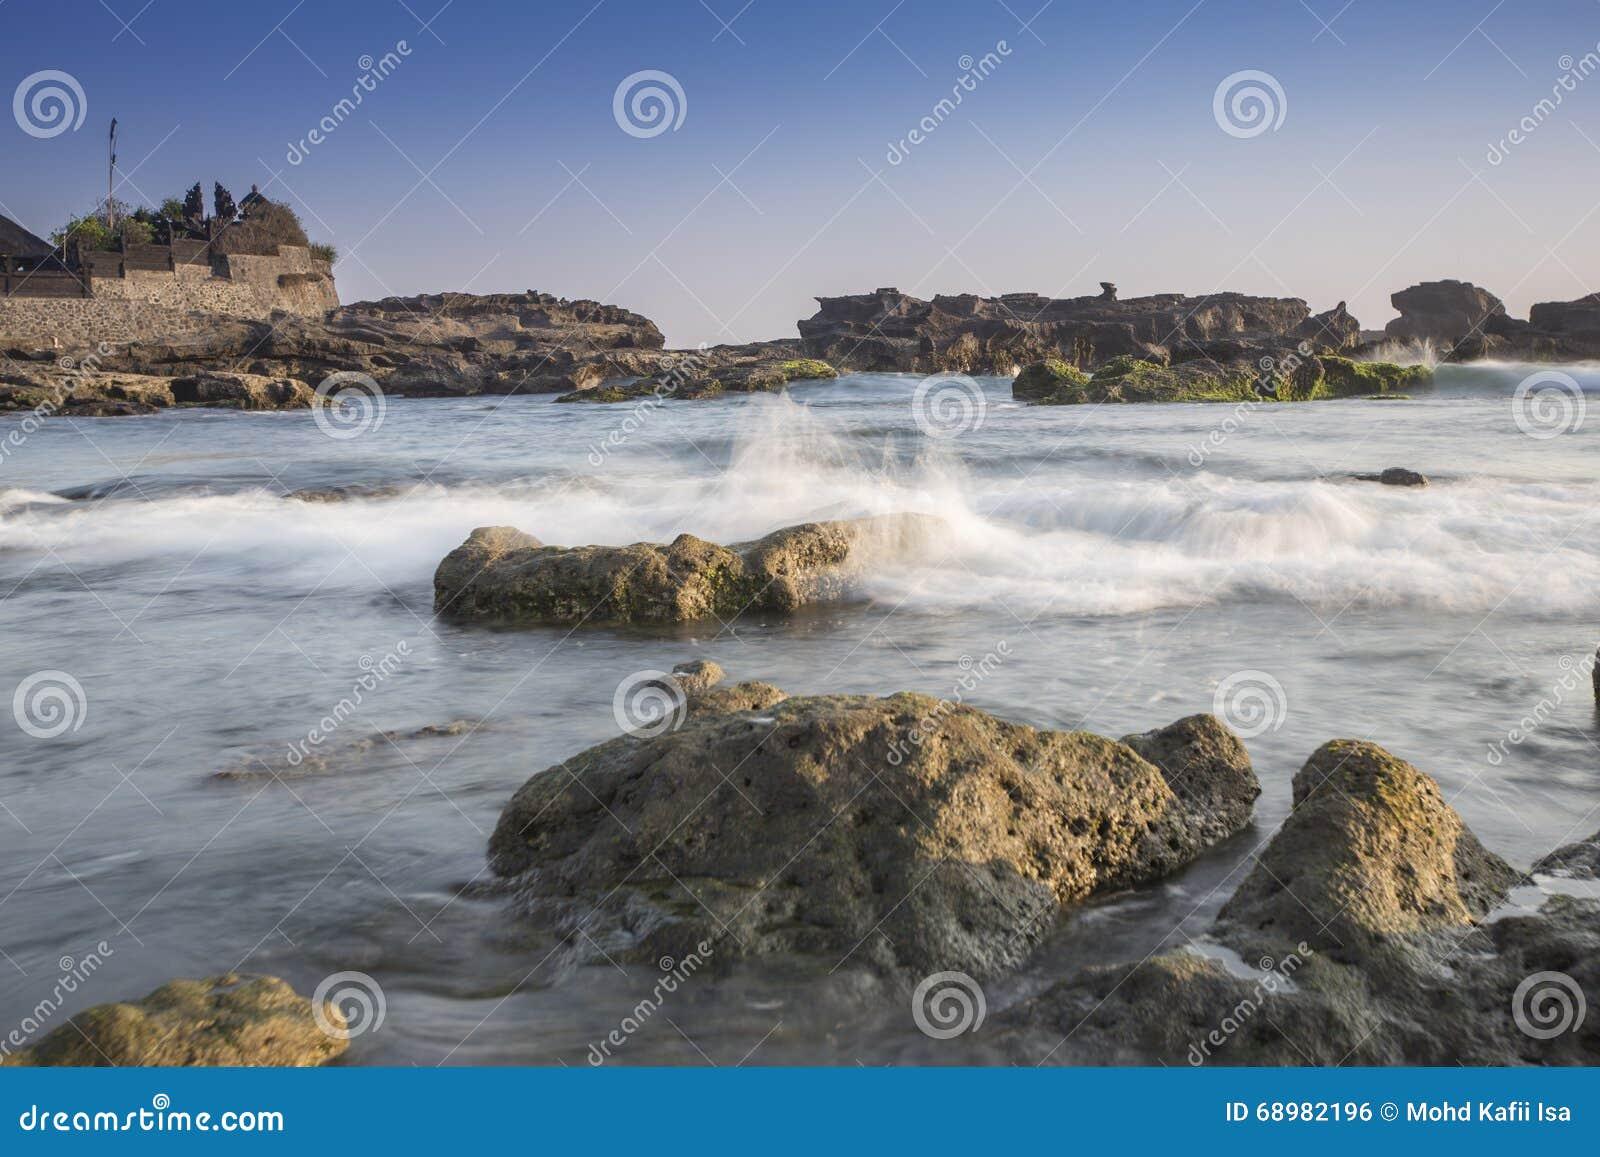 Snenic view of Beach in Bali